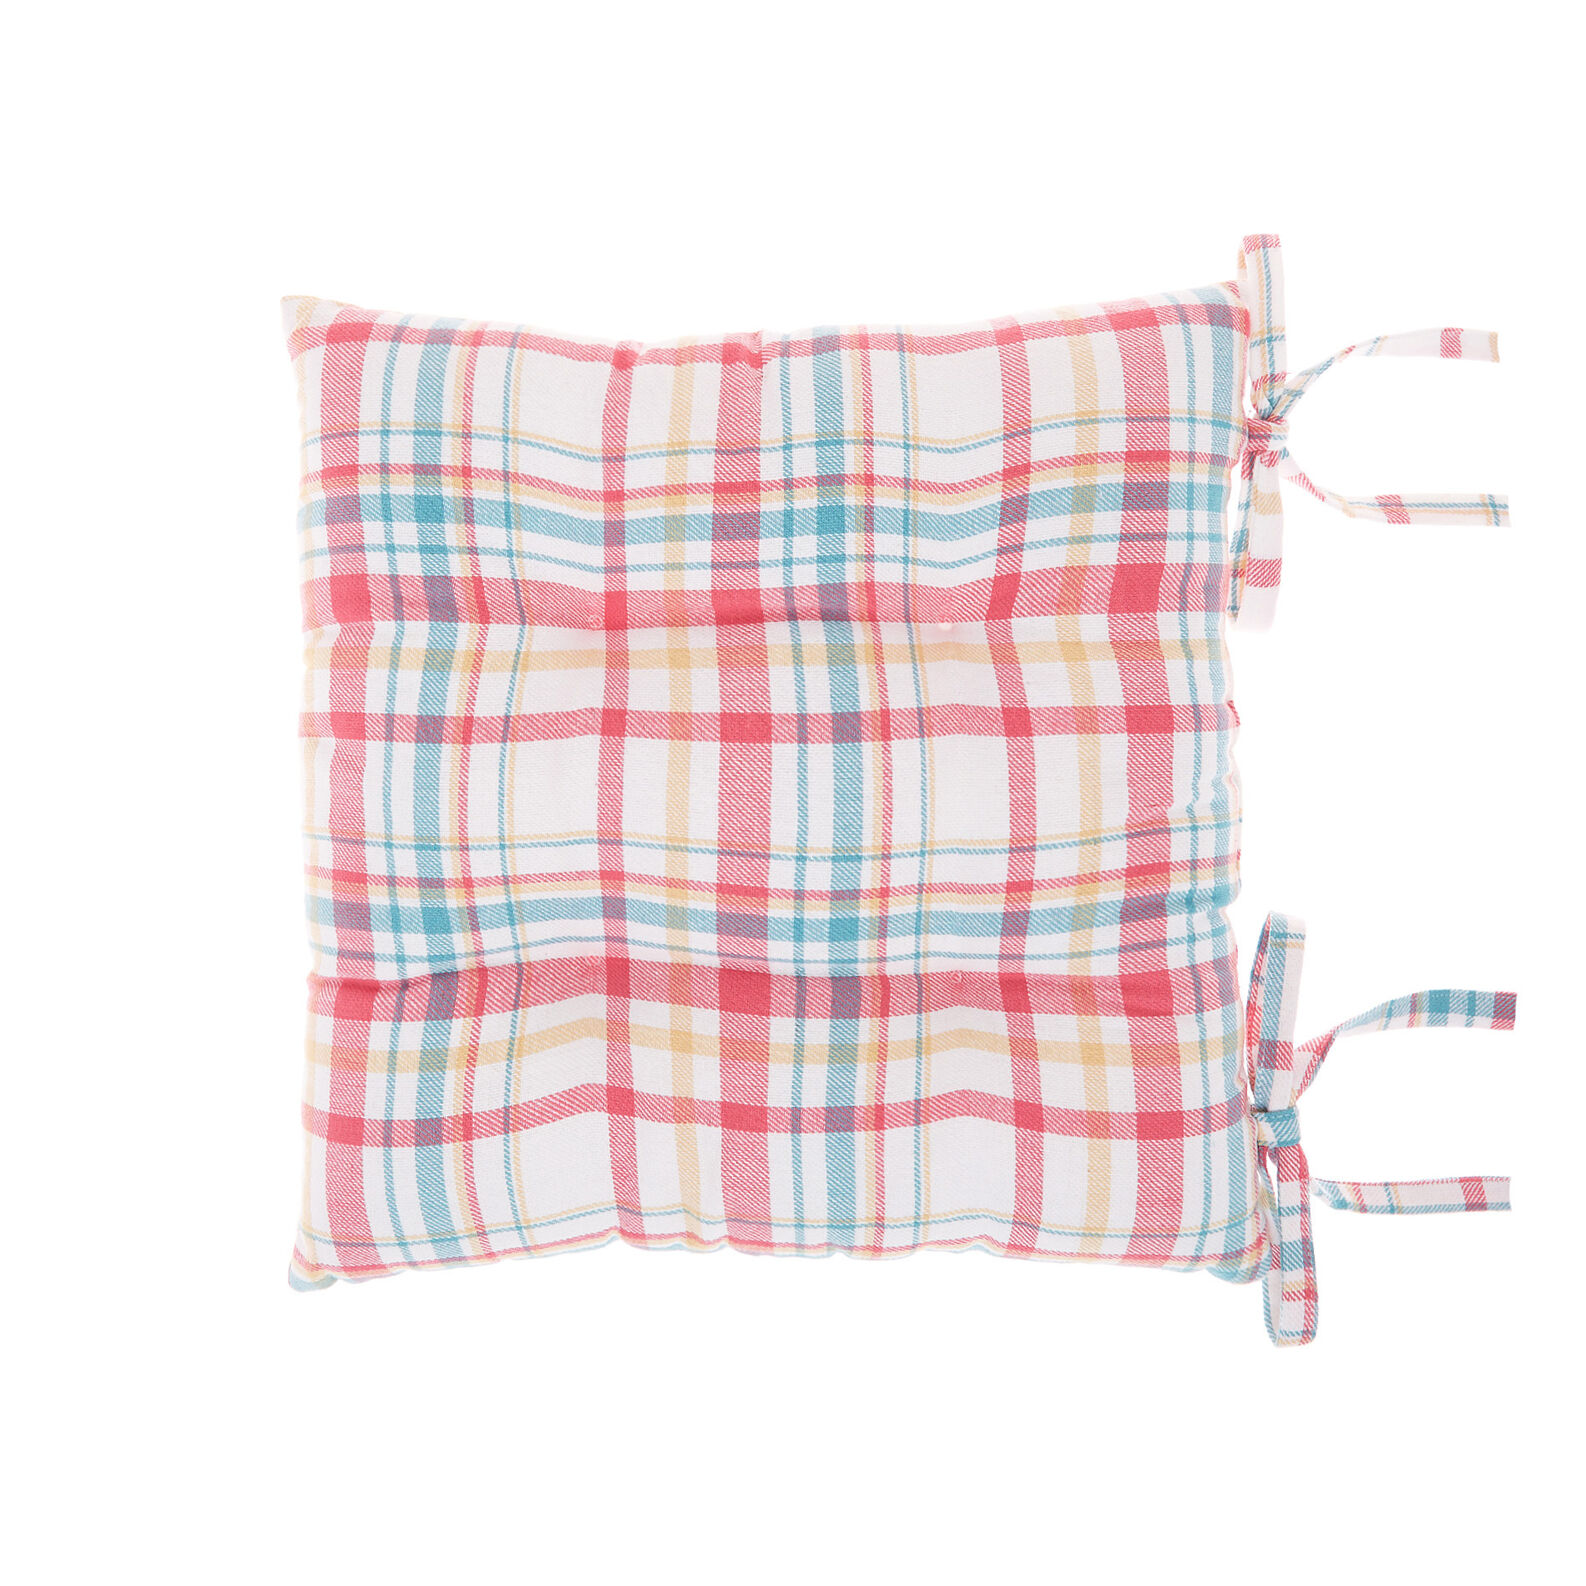 Cotton twill seat pad with Scottish design